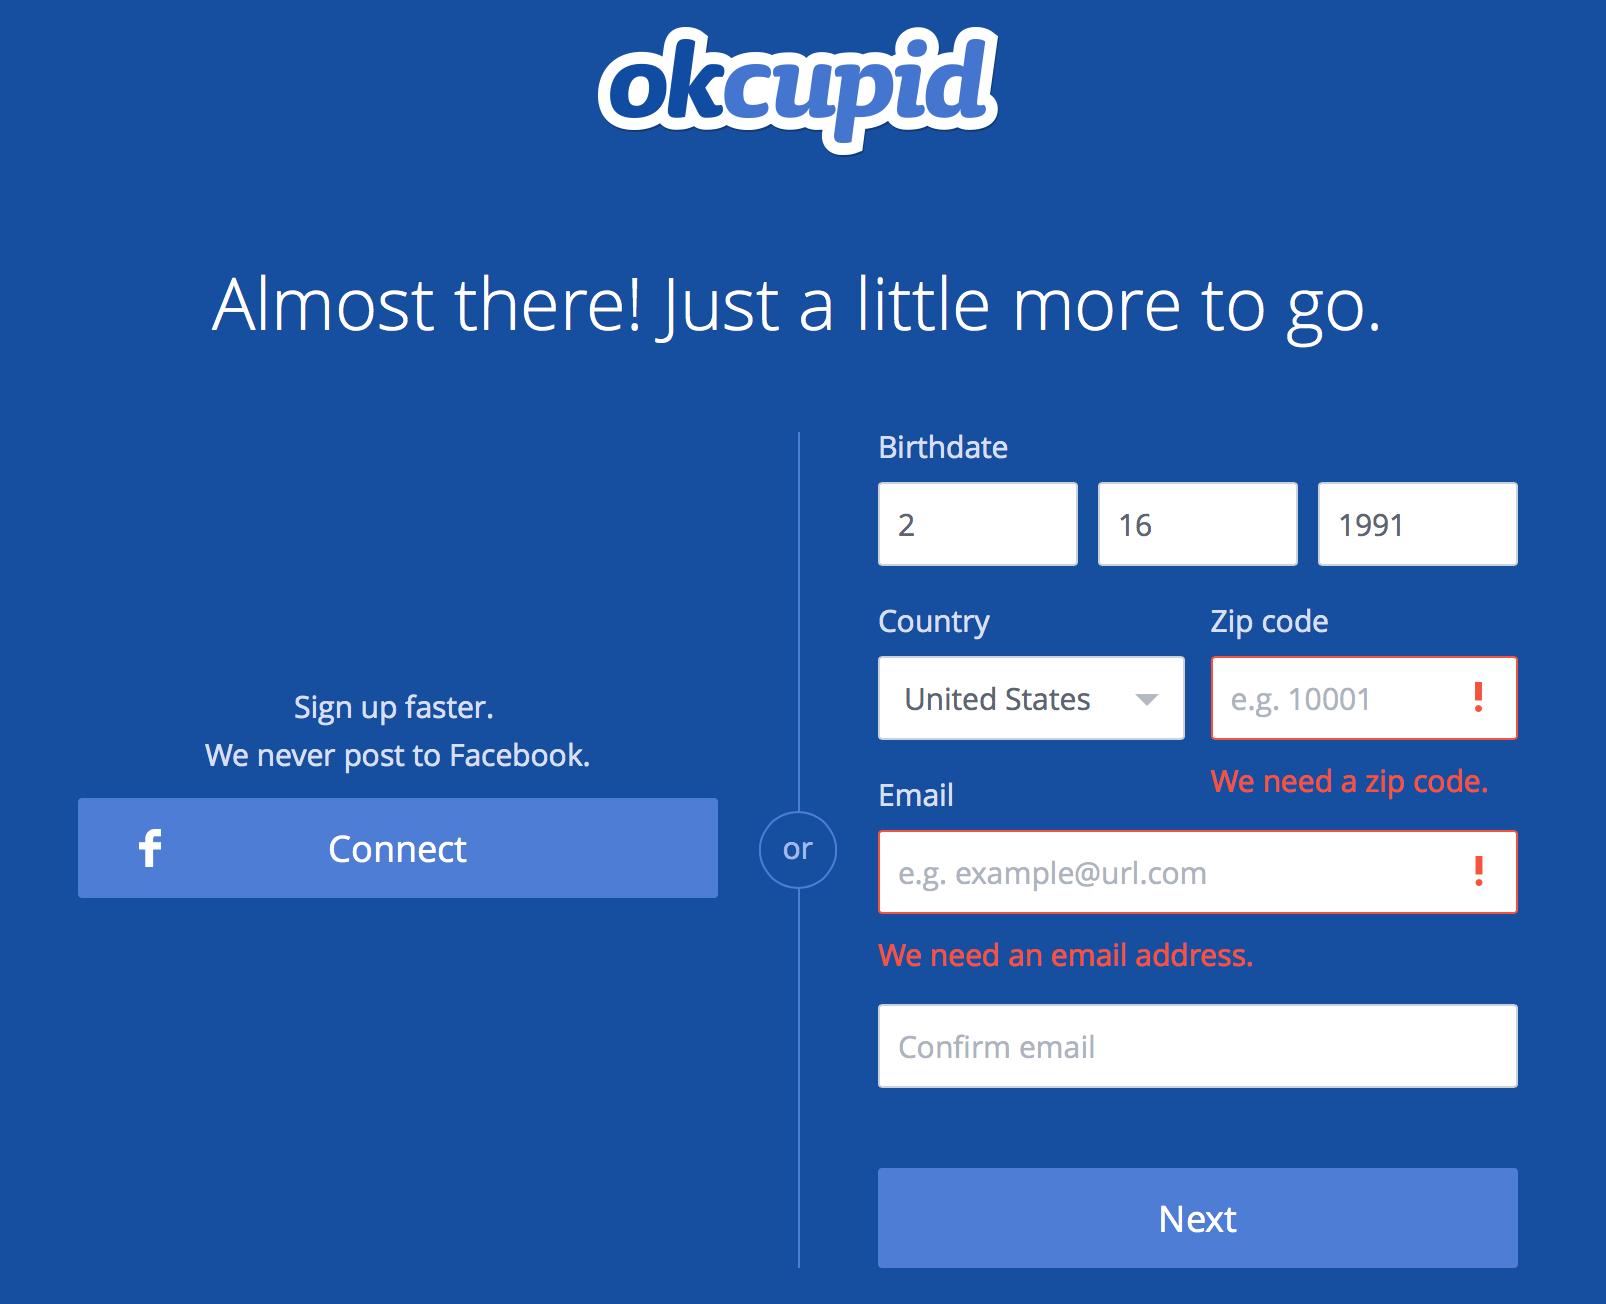 Errors okcupid.com | Okcupid, Interactive, Signup